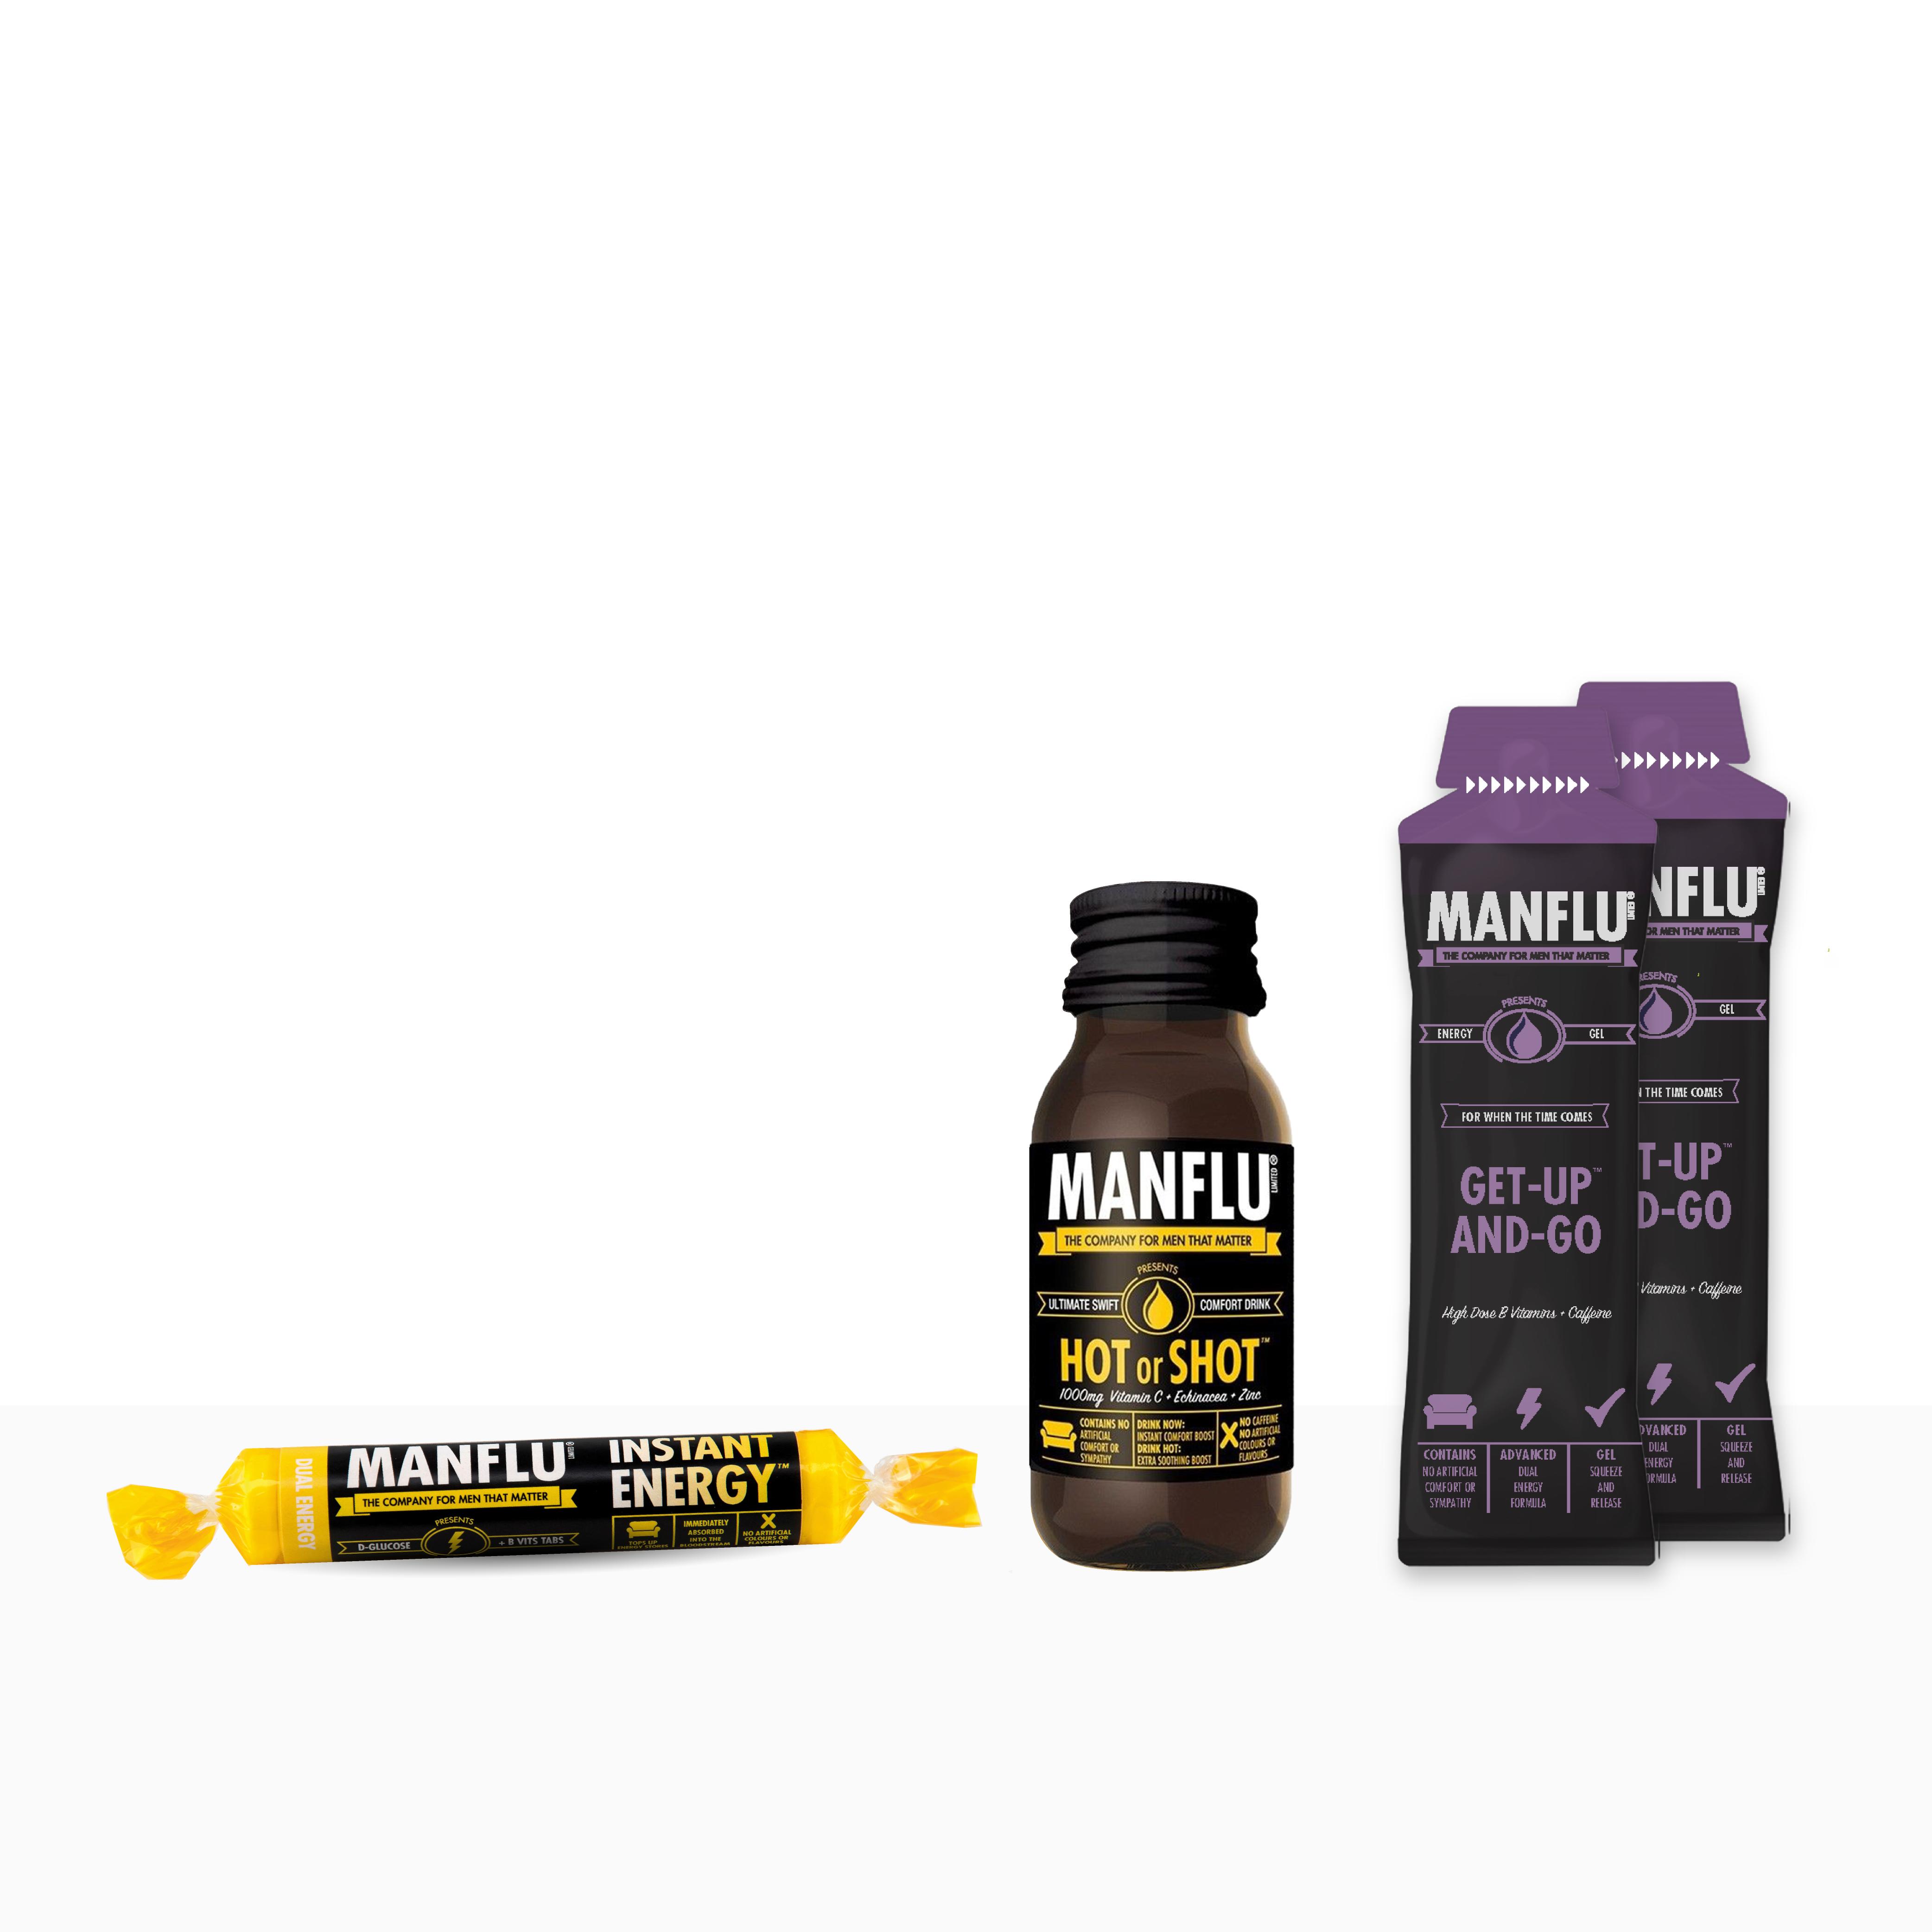 MANFLU Monday Kit: For men that matter!